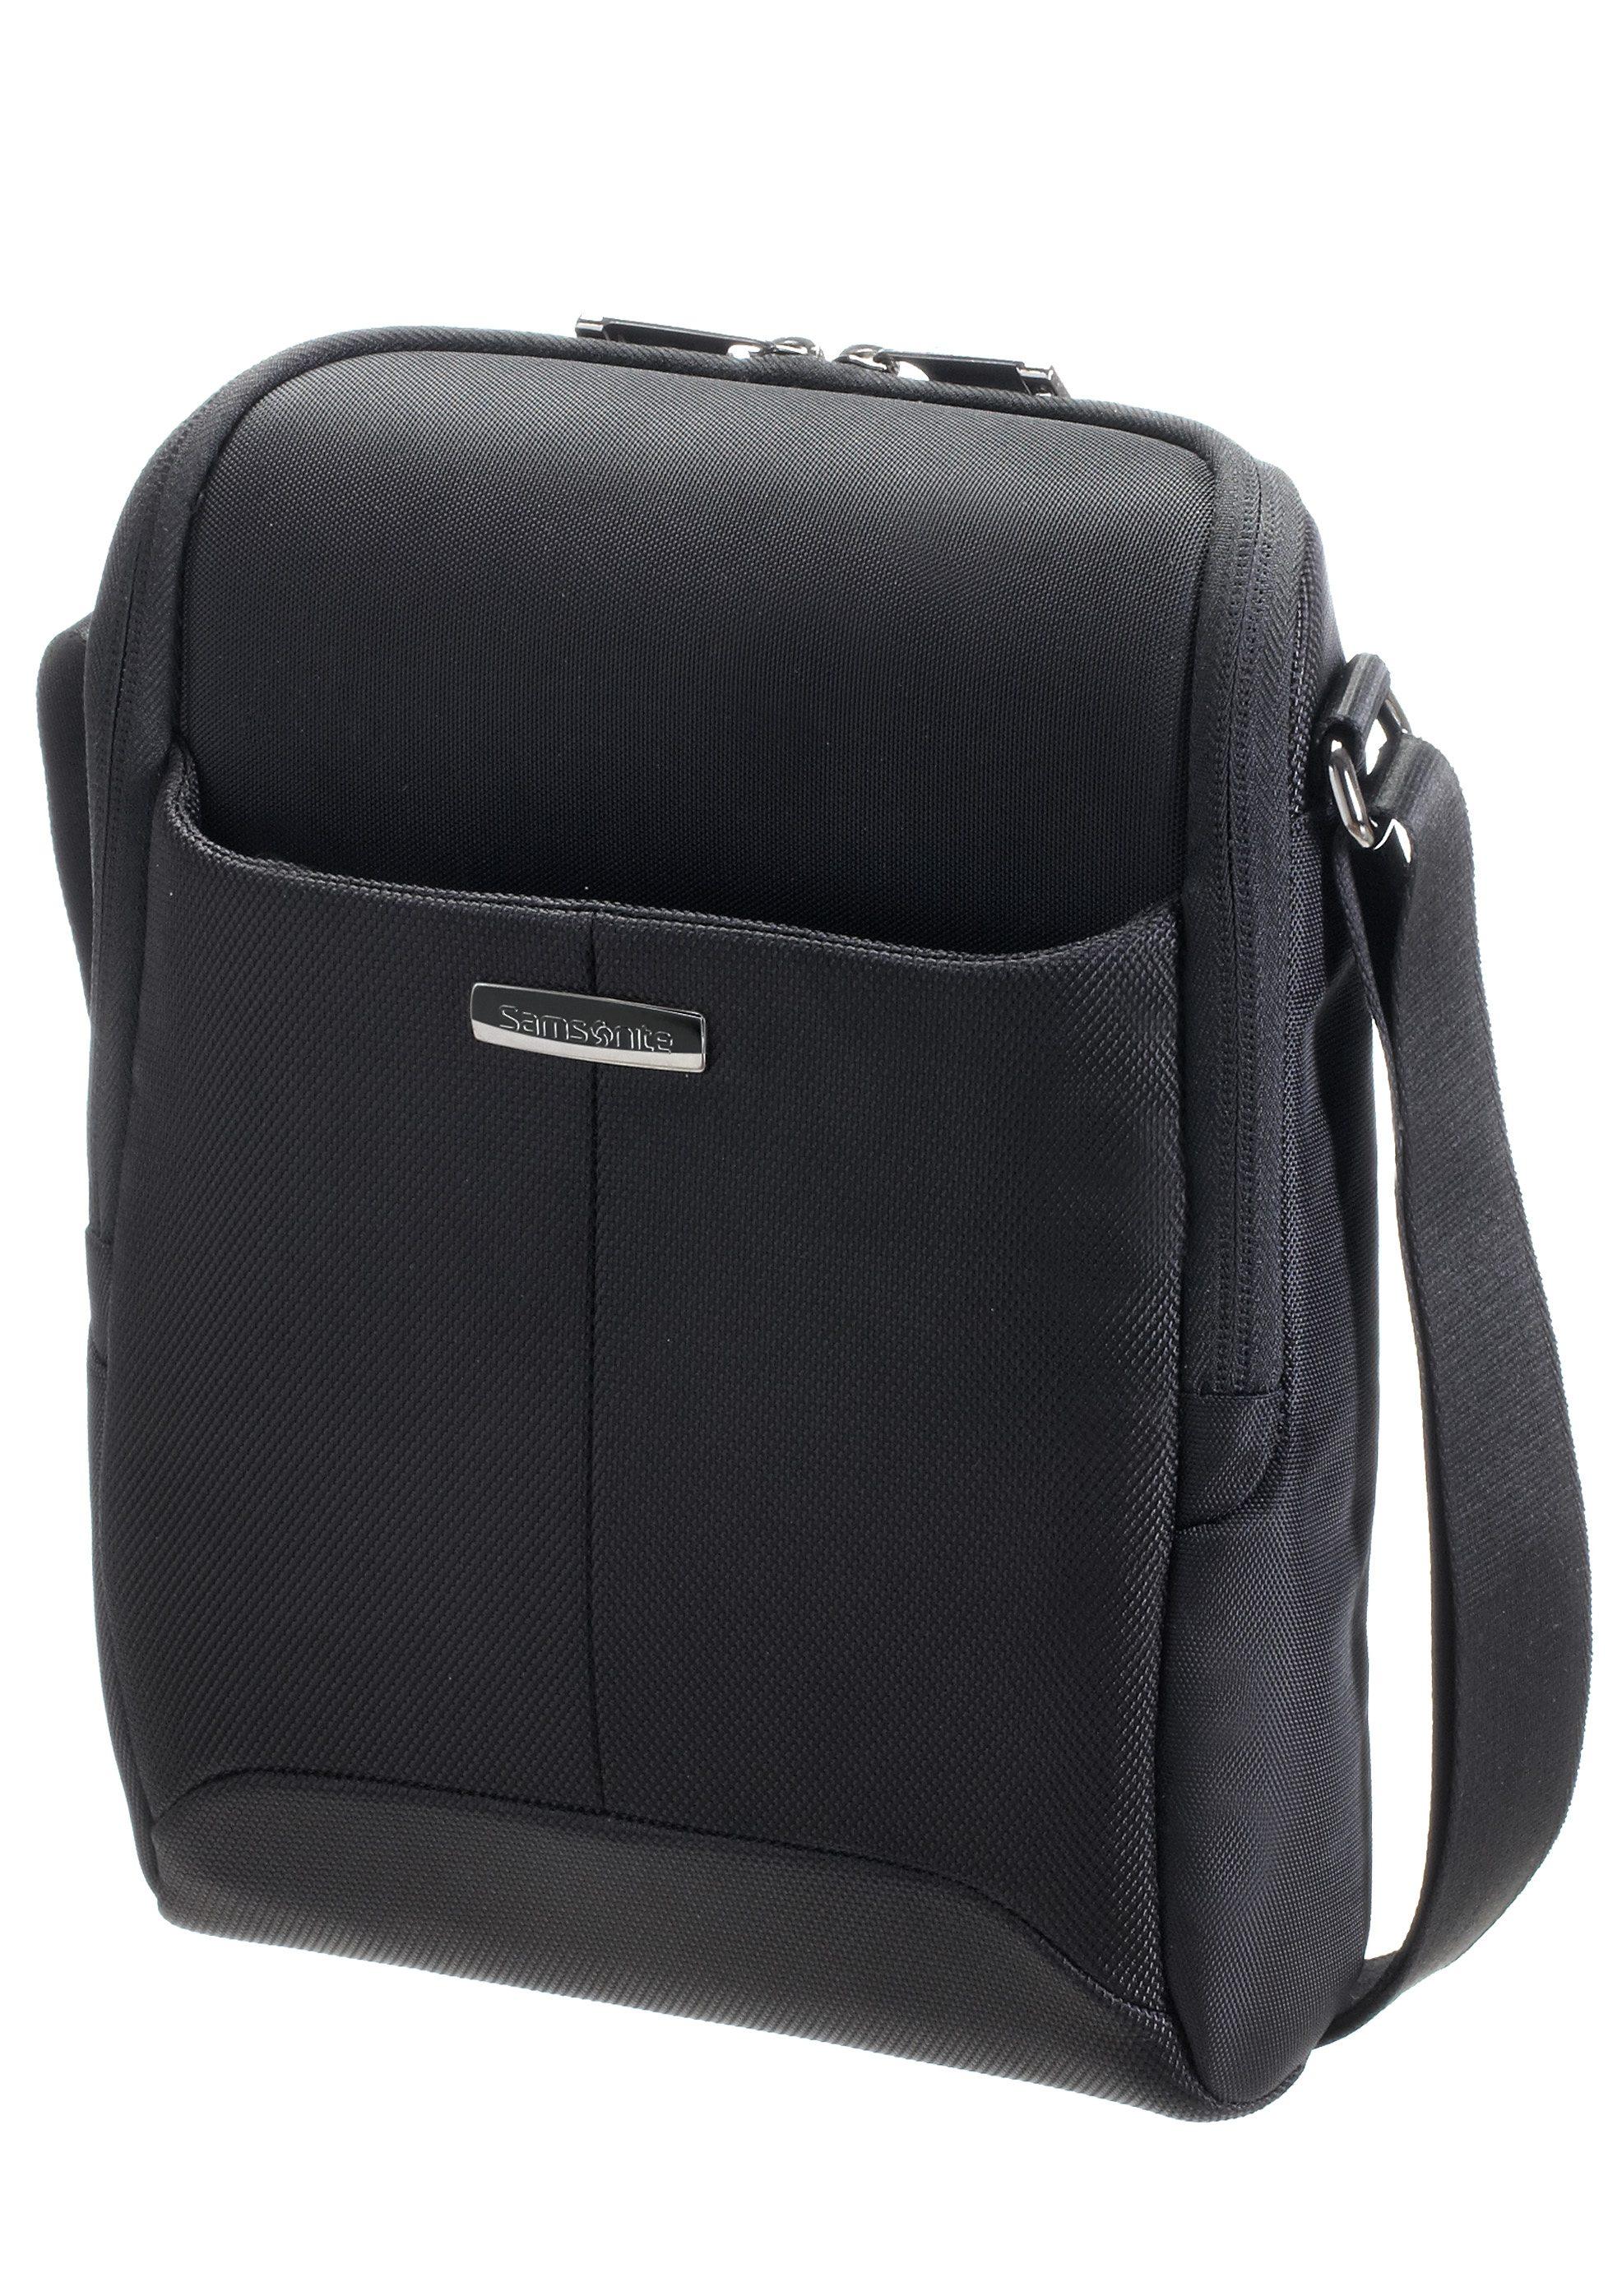 Samsonite Tablet-Tasche mit Schultergurt, »Ergo-Biz Tablet Cross-Over«